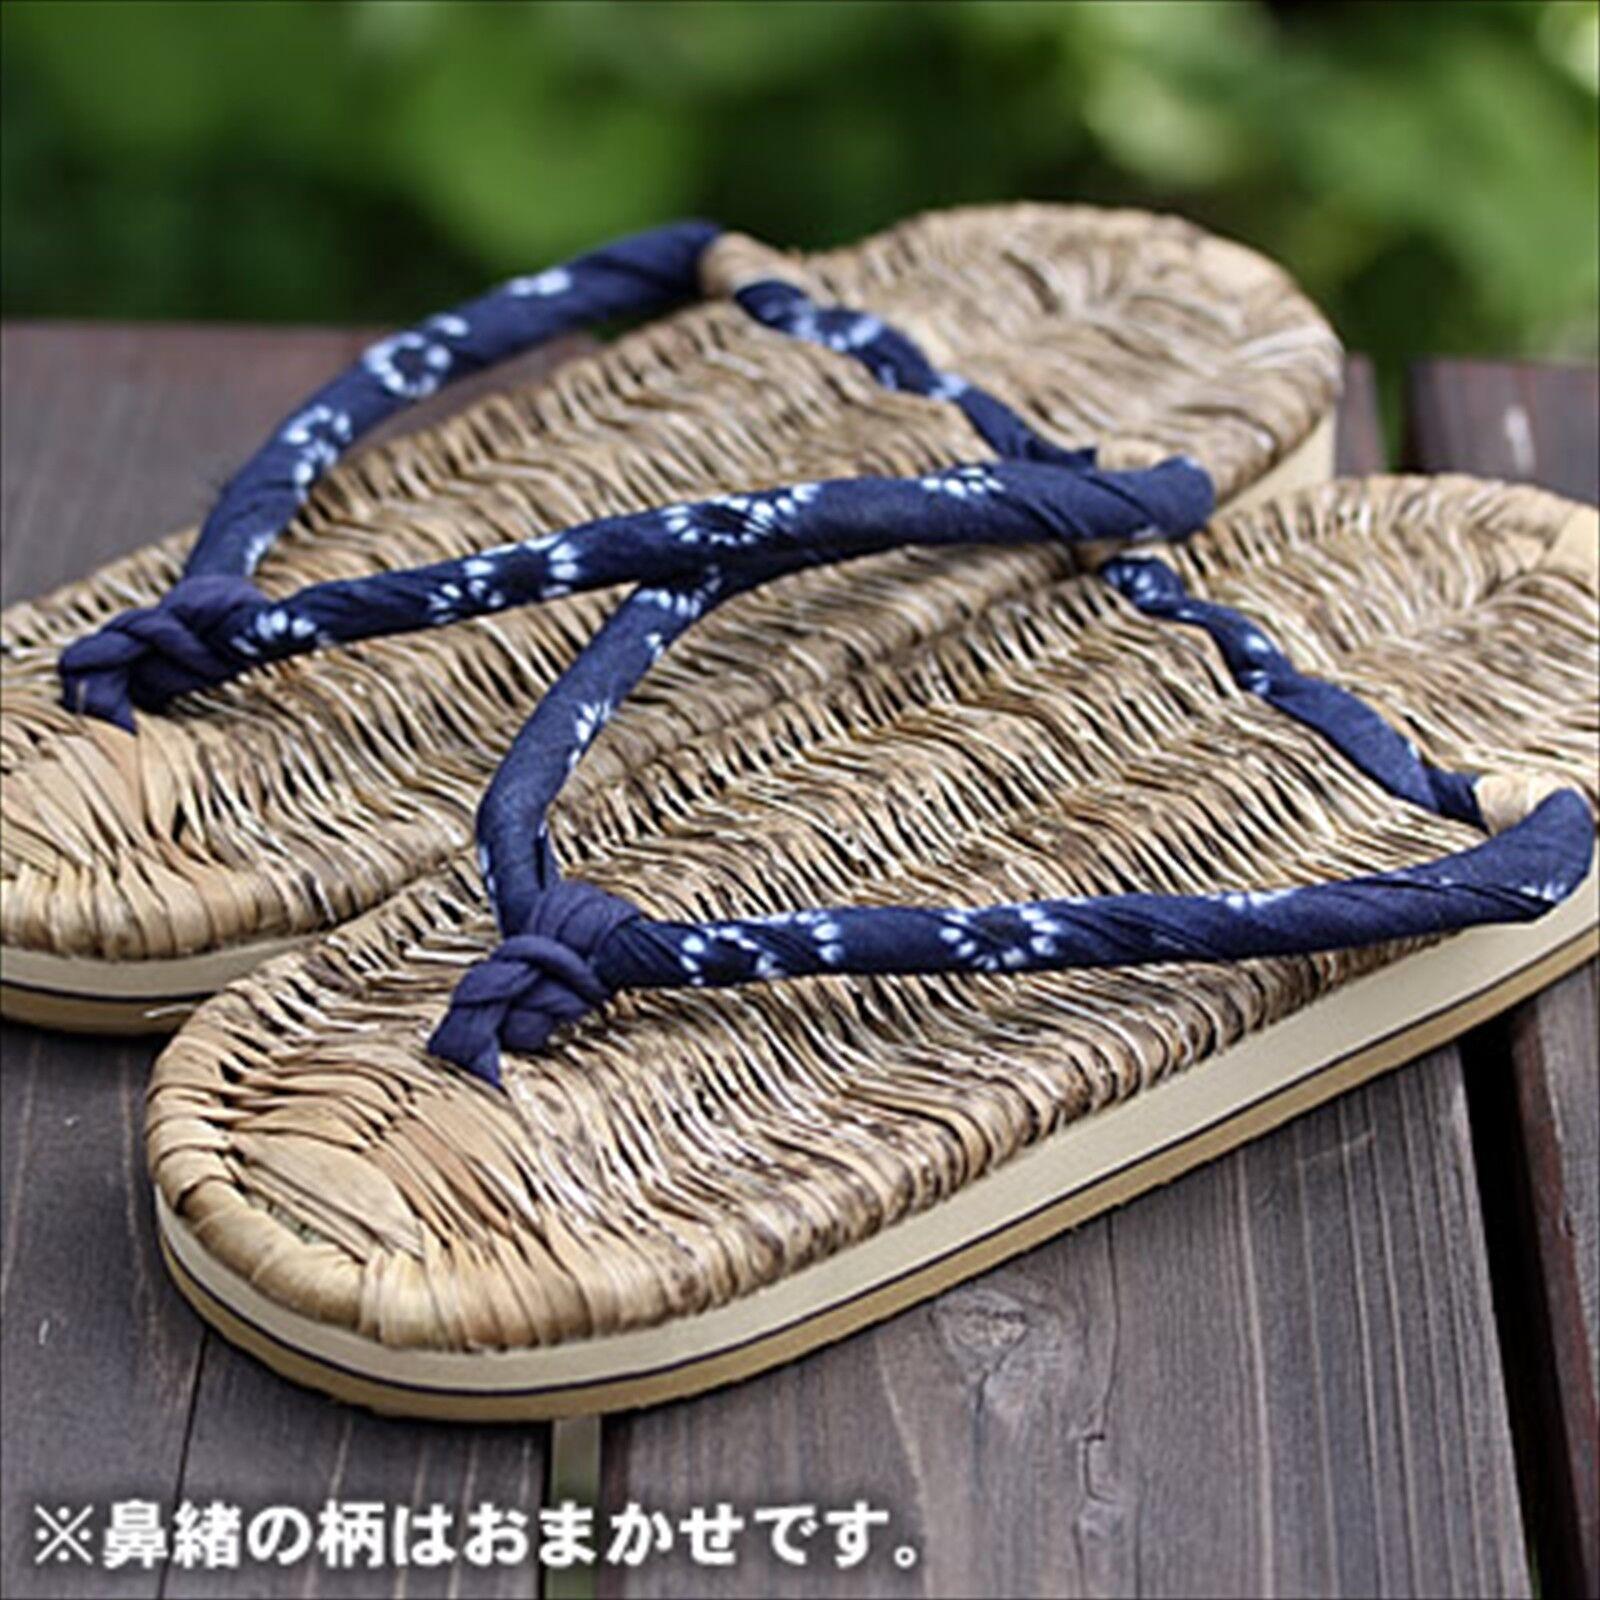 Japanese Traditional Bamboo Skin Health Slippers Zori Waraji Hand Made Mens 28cm